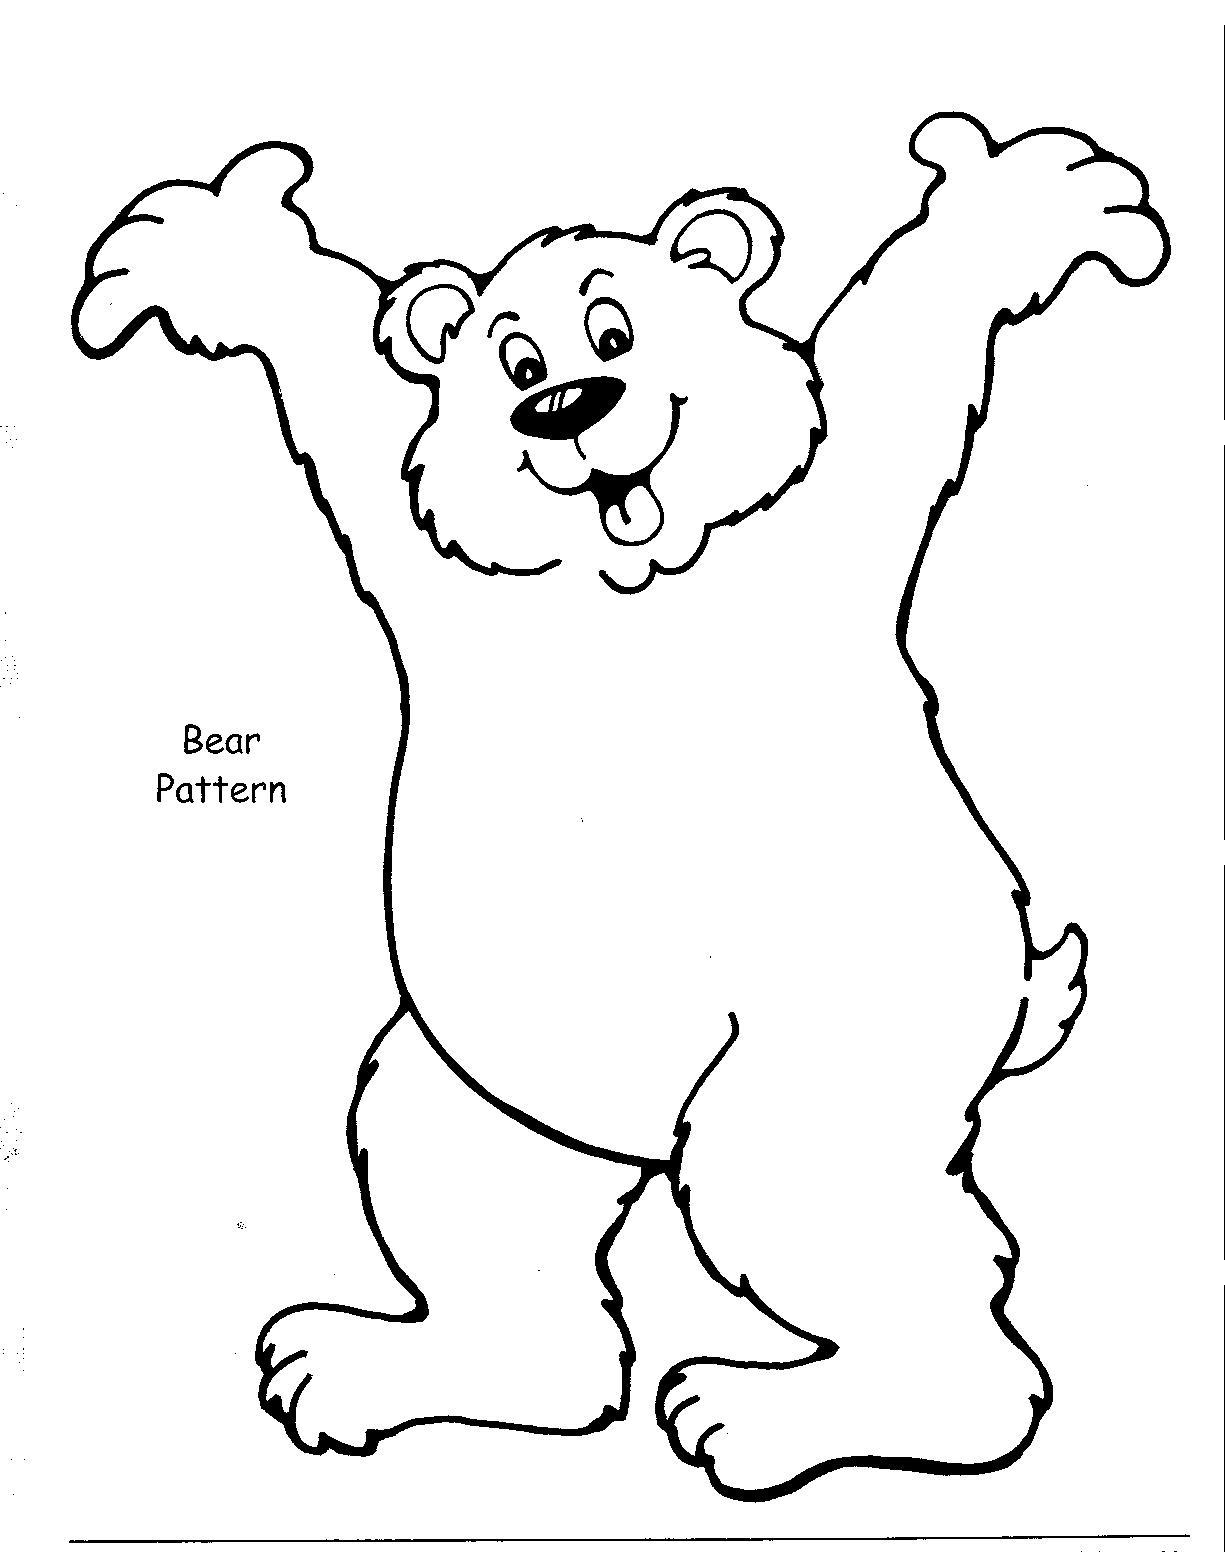 Bear Template Printable | New Calendar Template Site